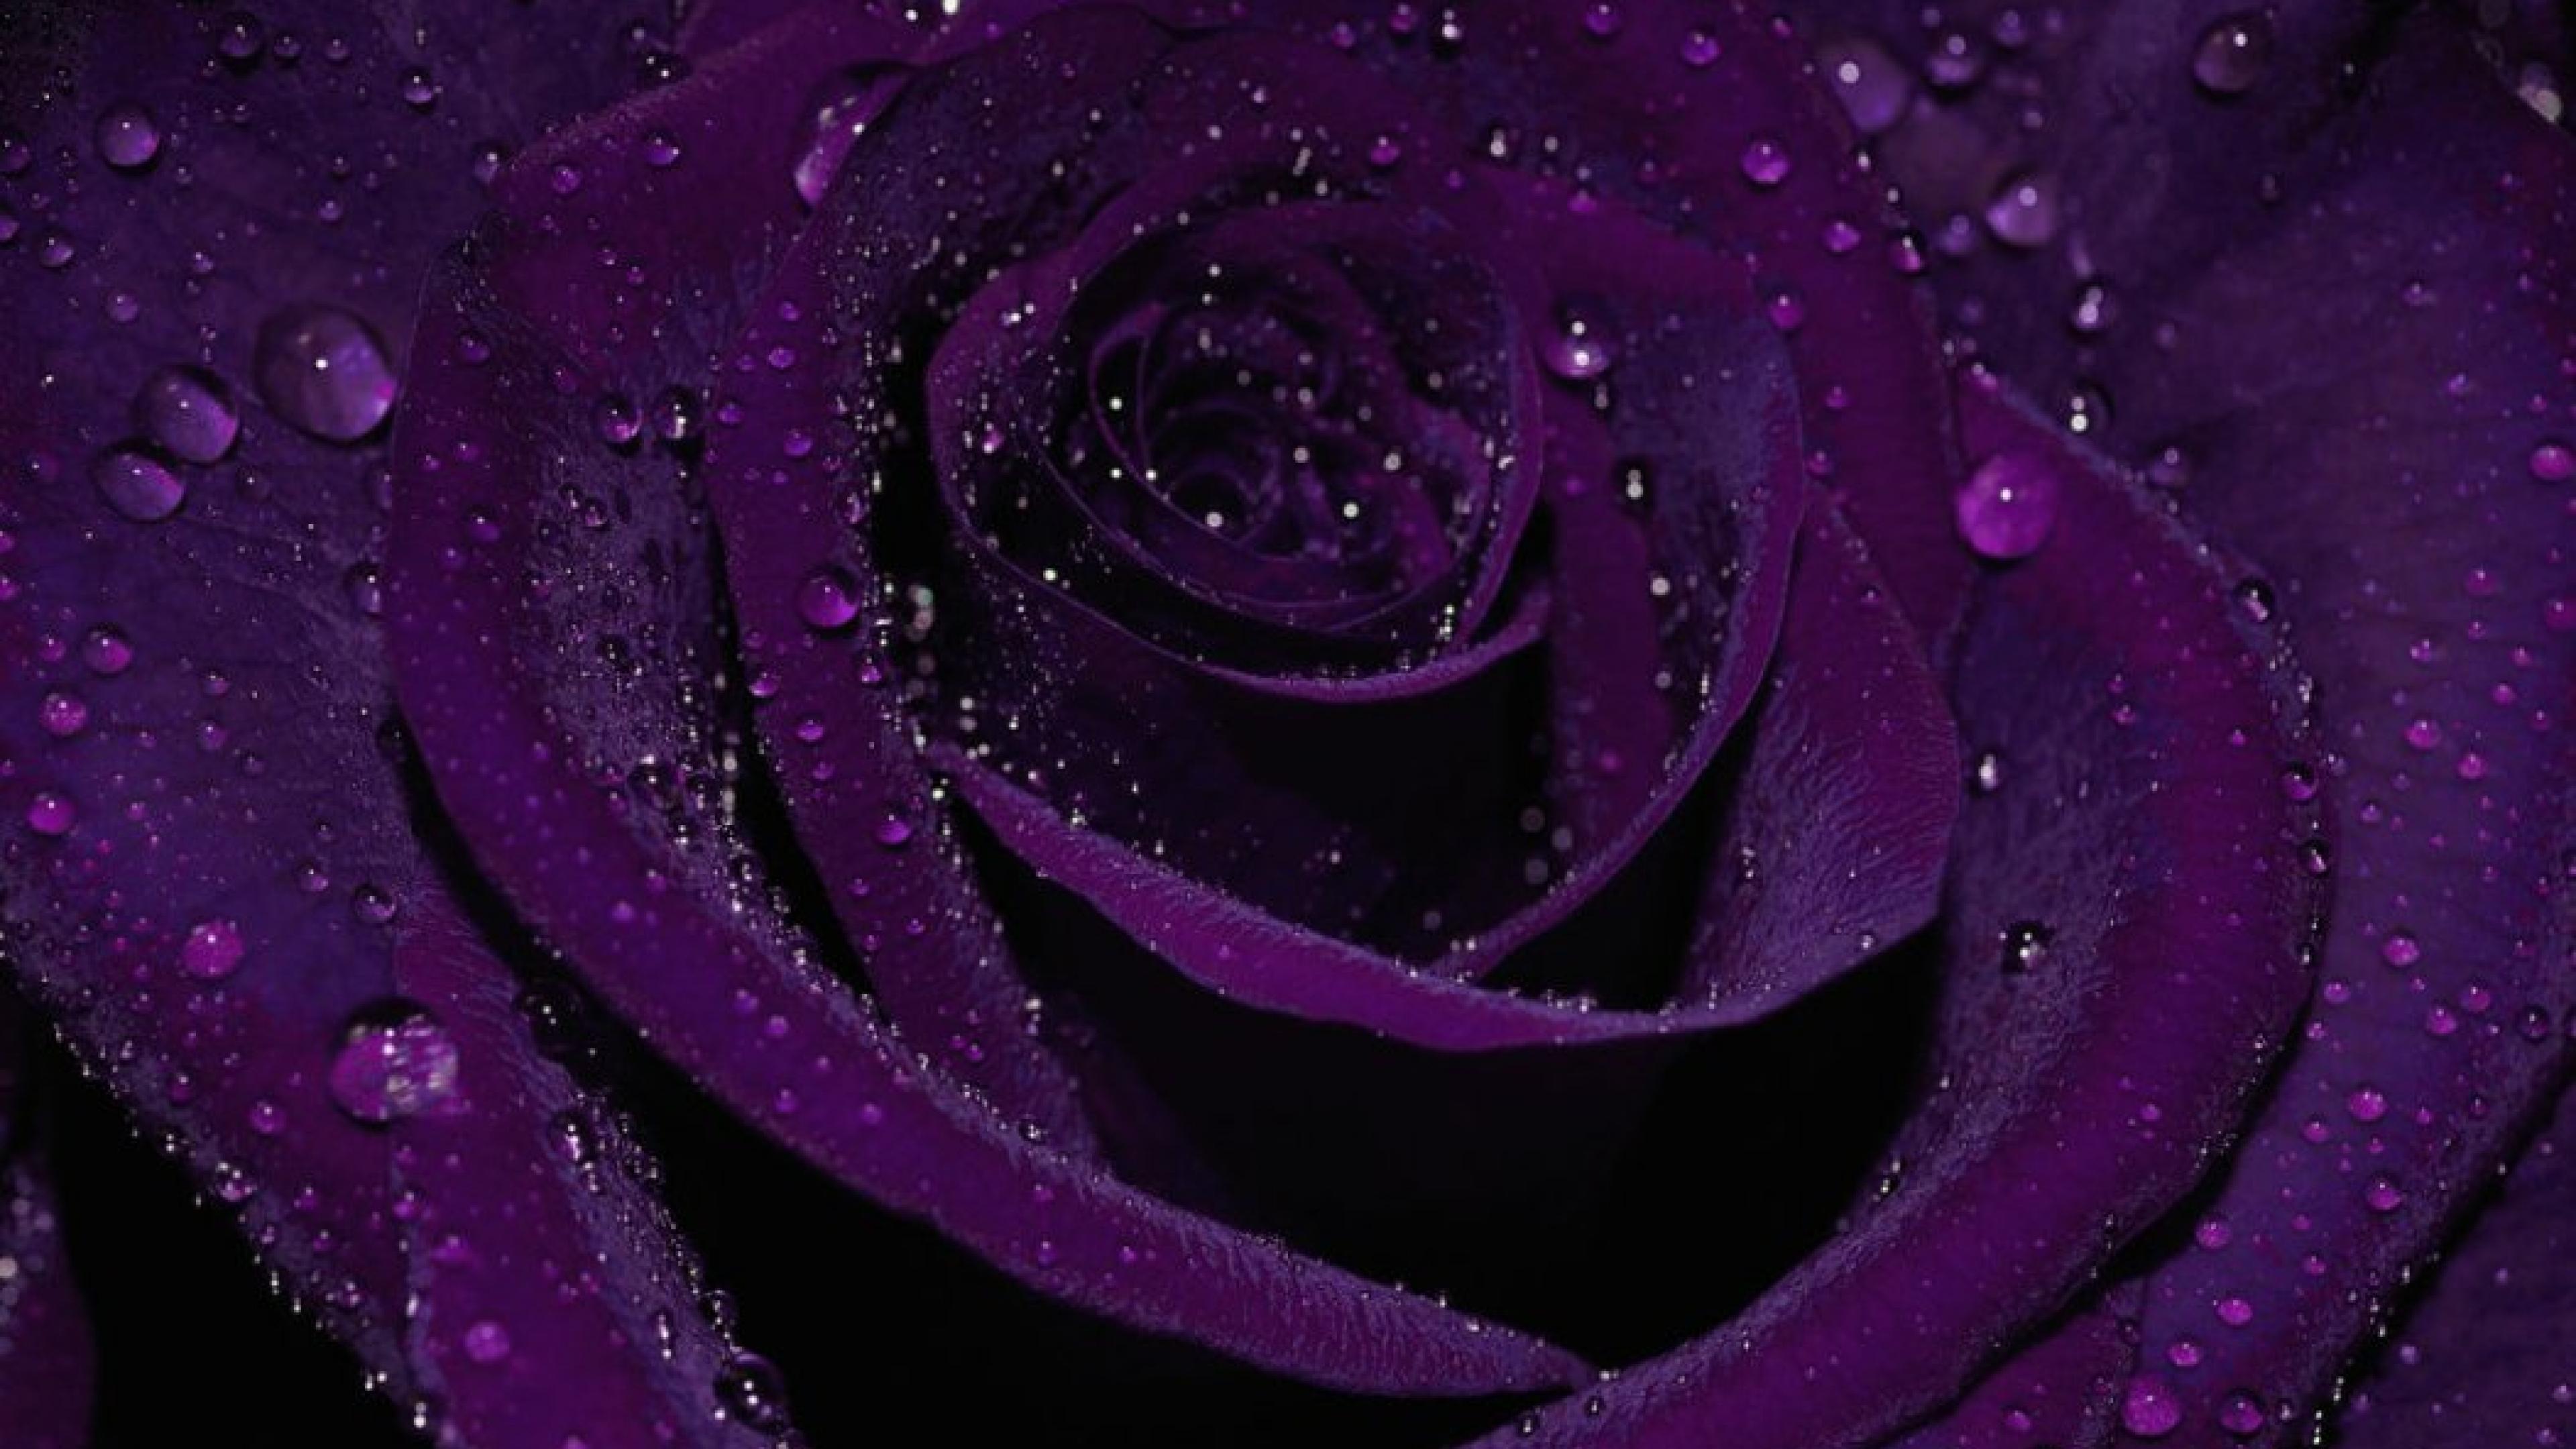 Purple Rose 4k